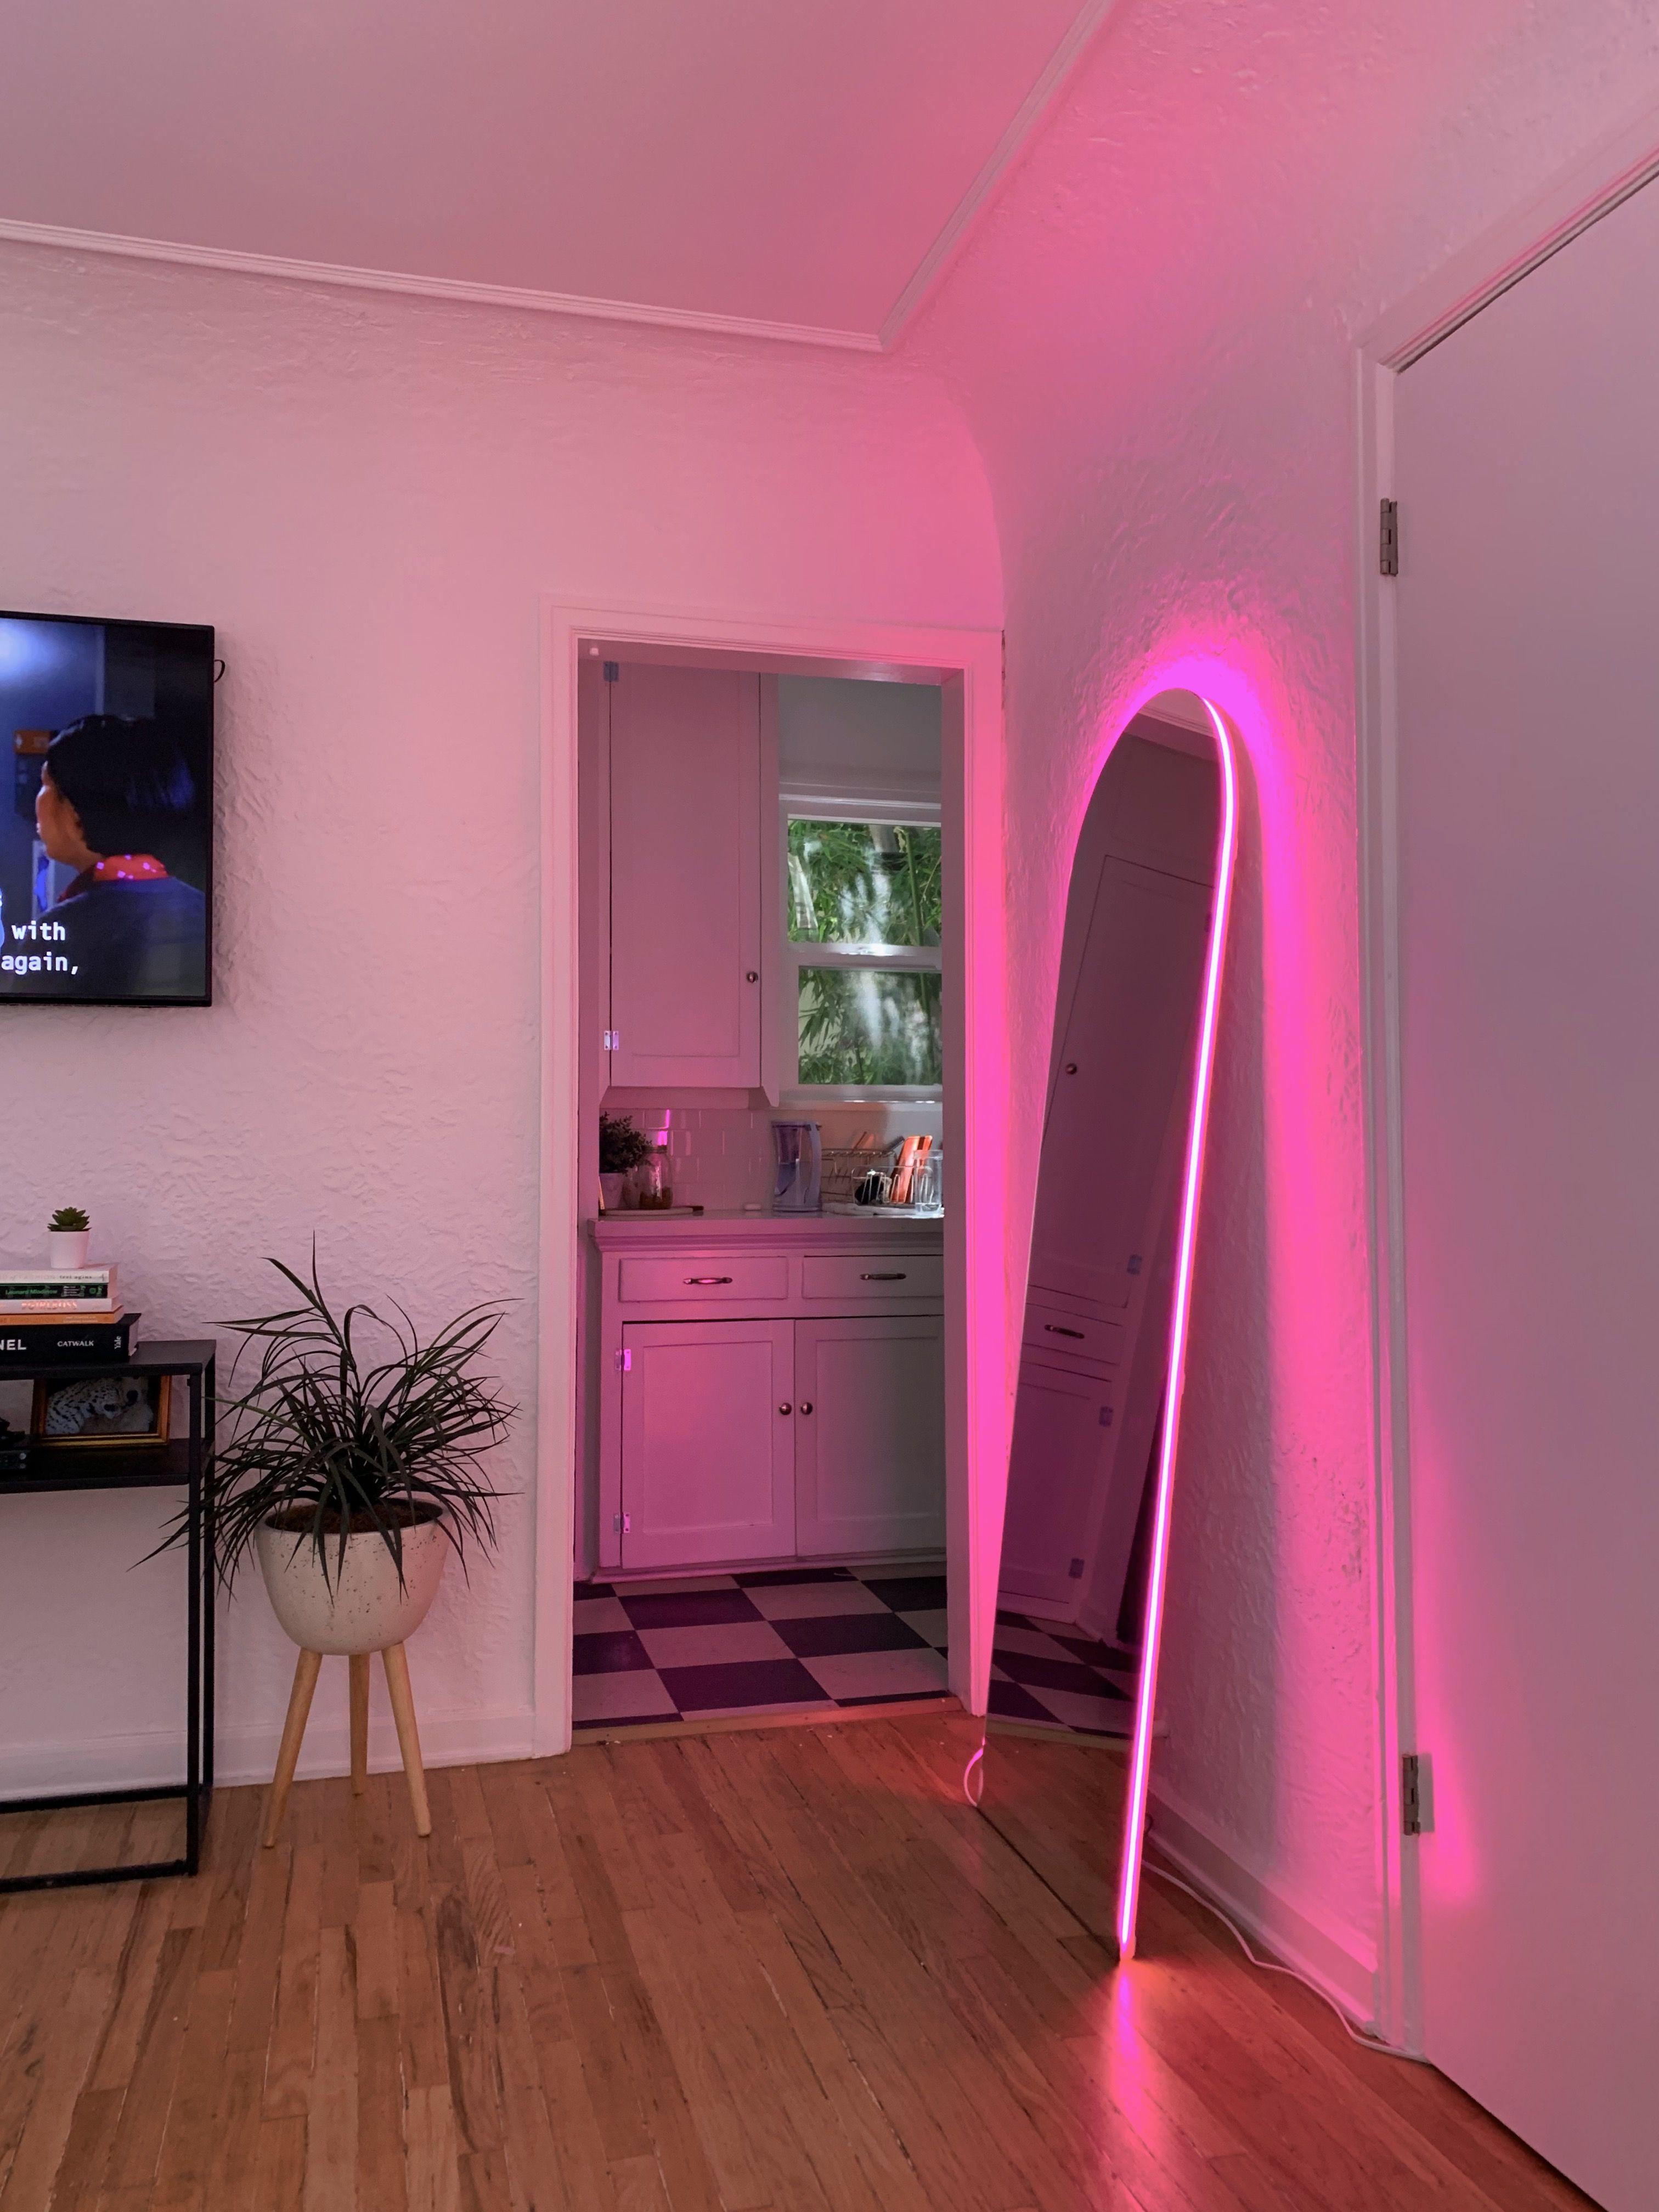 My Living Room In 2020 Aesthetic Room Decor Room Ideas Bedroom Boho Living Room #neon #lights #for #living #room